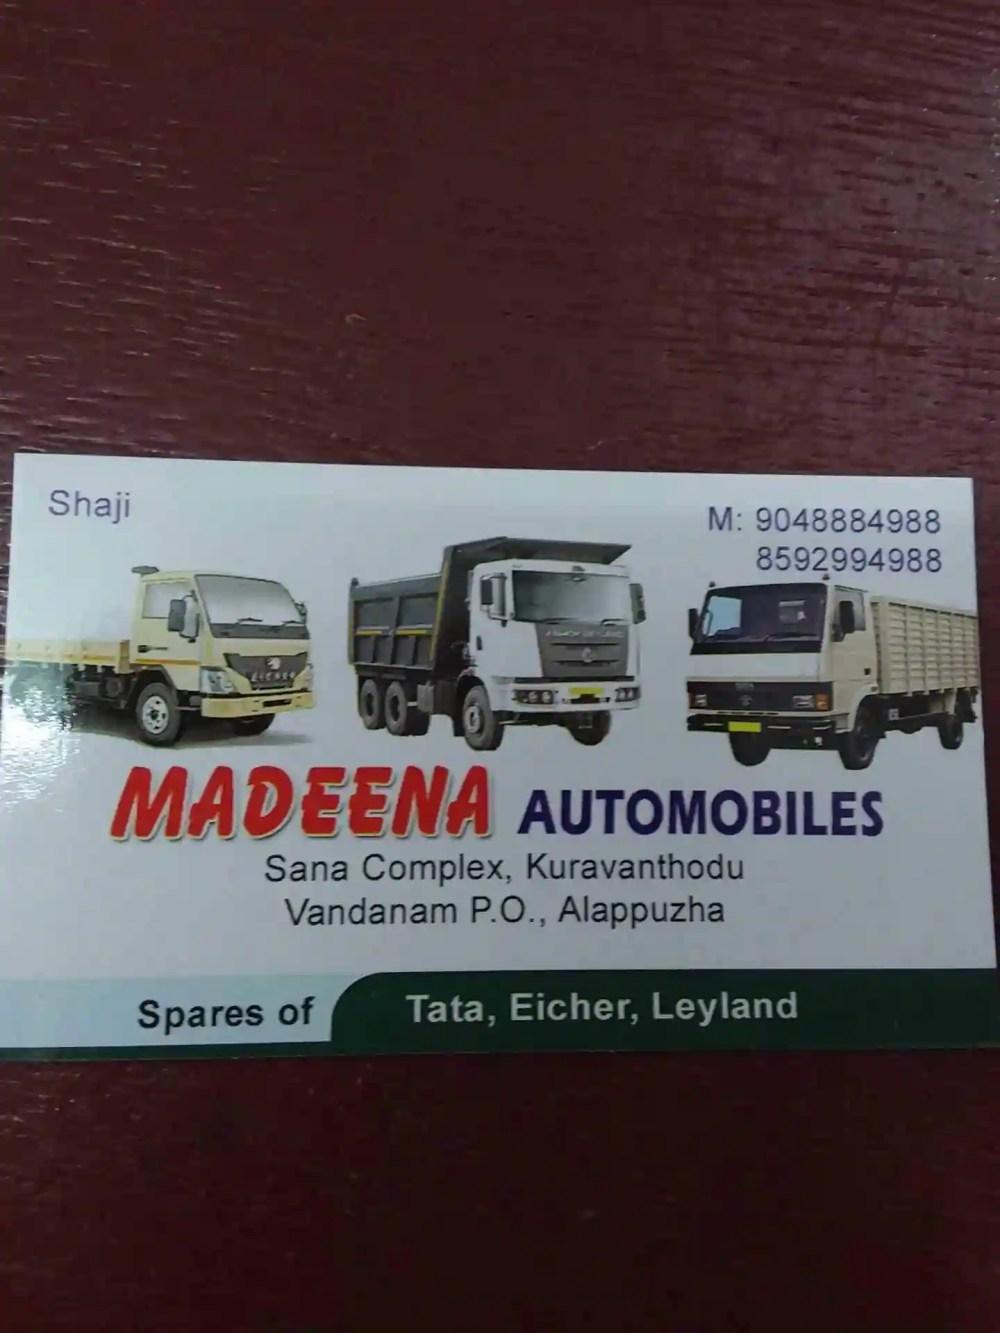 medium resolution of madeena automobiles kakkazhom automobile part dealers in alappuzha justdial